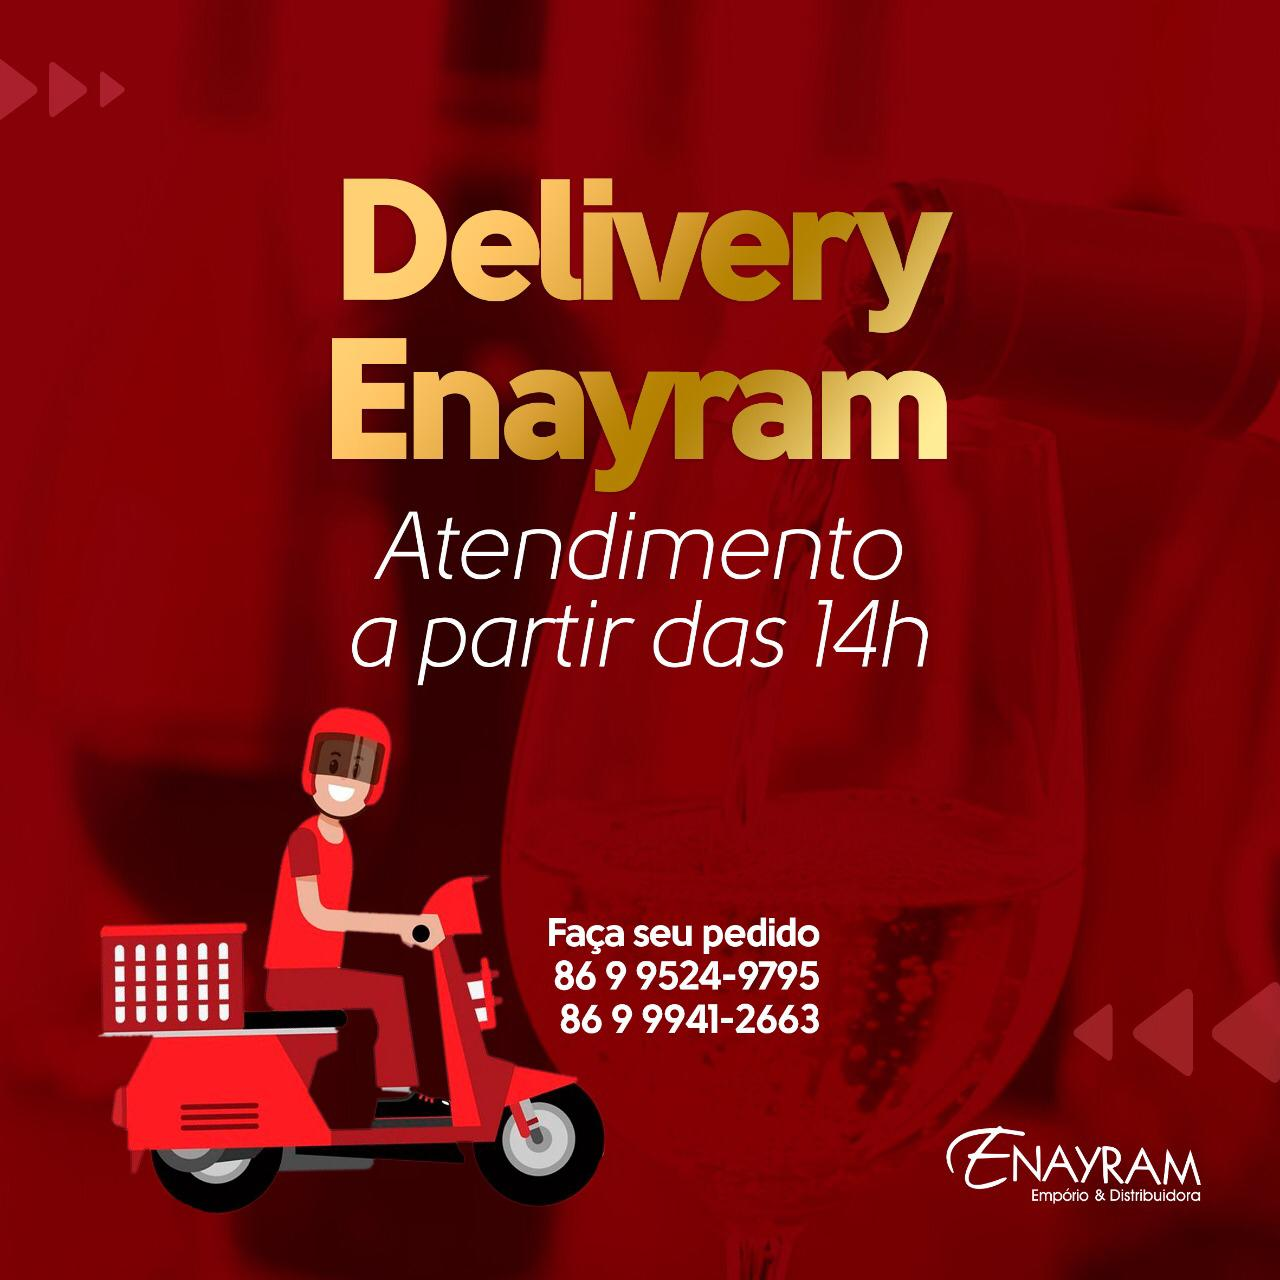 Enayram